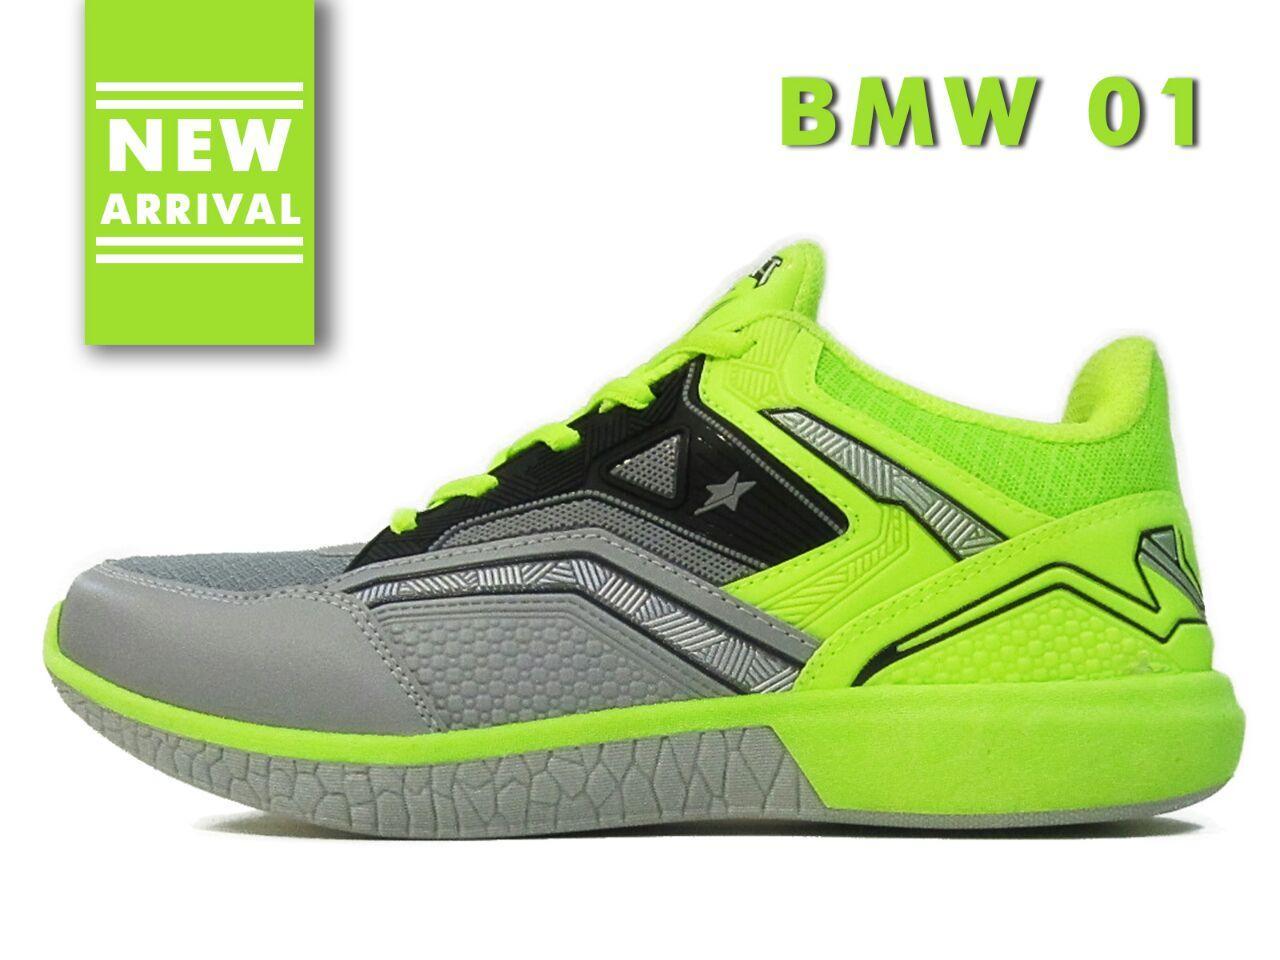 Amelia Olshop - Pro ATT Sepatu Sneaker Pria / Sepatu Pria / Sepatu Olahraga / Sepatu Sport / Sepatu Murah / Sepatu High Quality New Arrival - BMW 01 Hijau